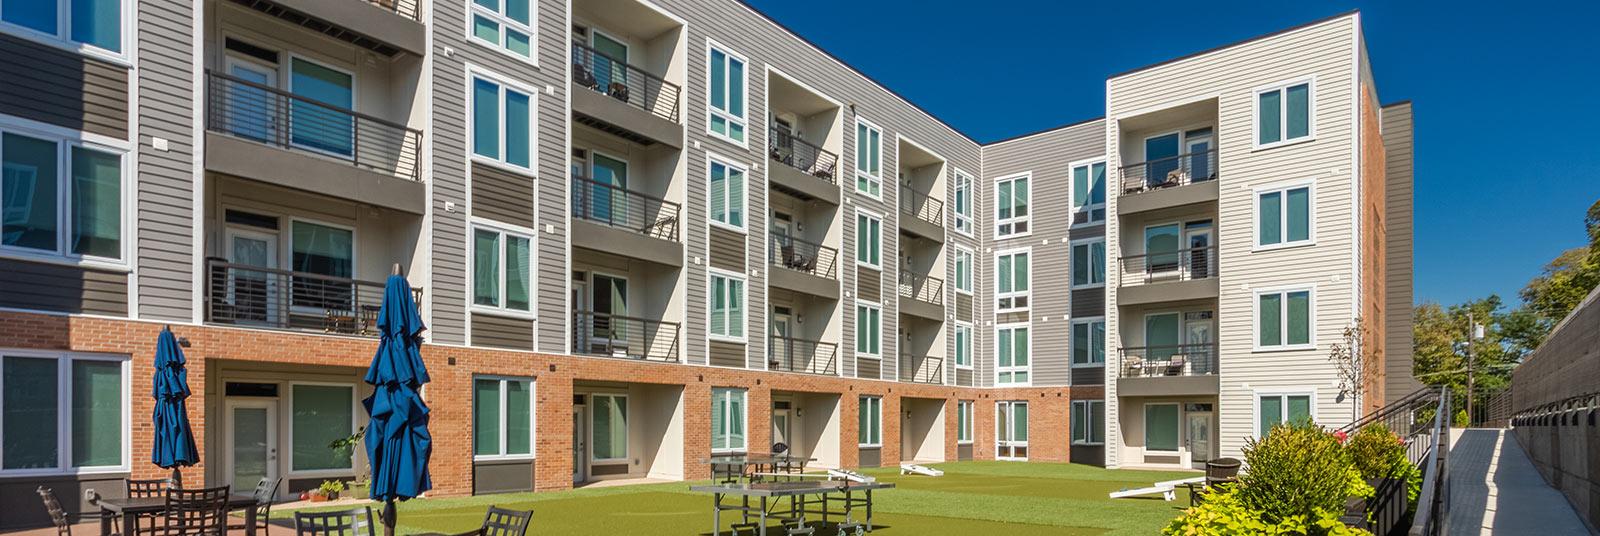 Green space between apartment buildings at One41 Wellington in Cincinnati, Ohio.